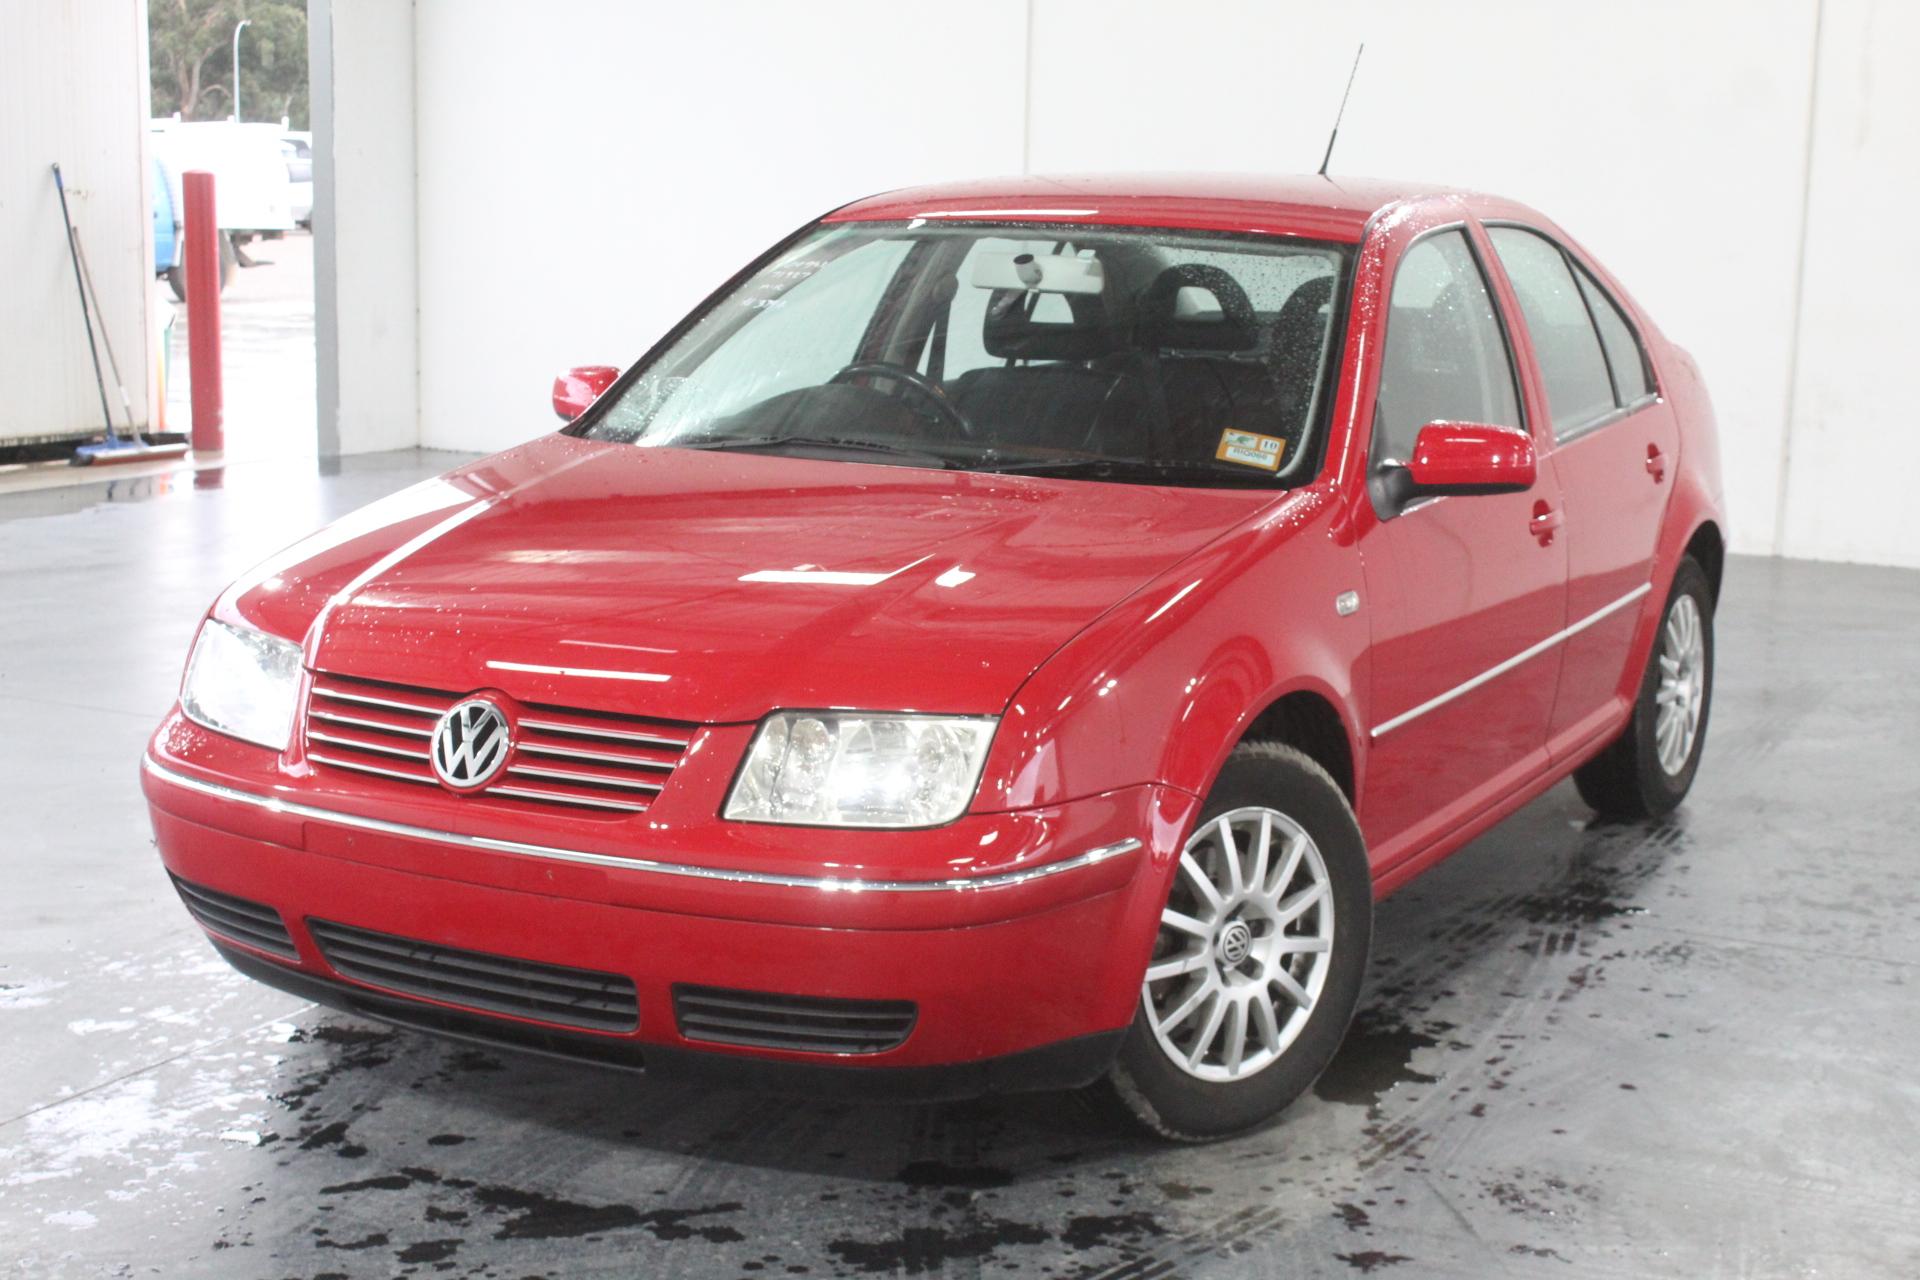 2002 Volkswagen Bora 2.0 1J Automatic Sedan